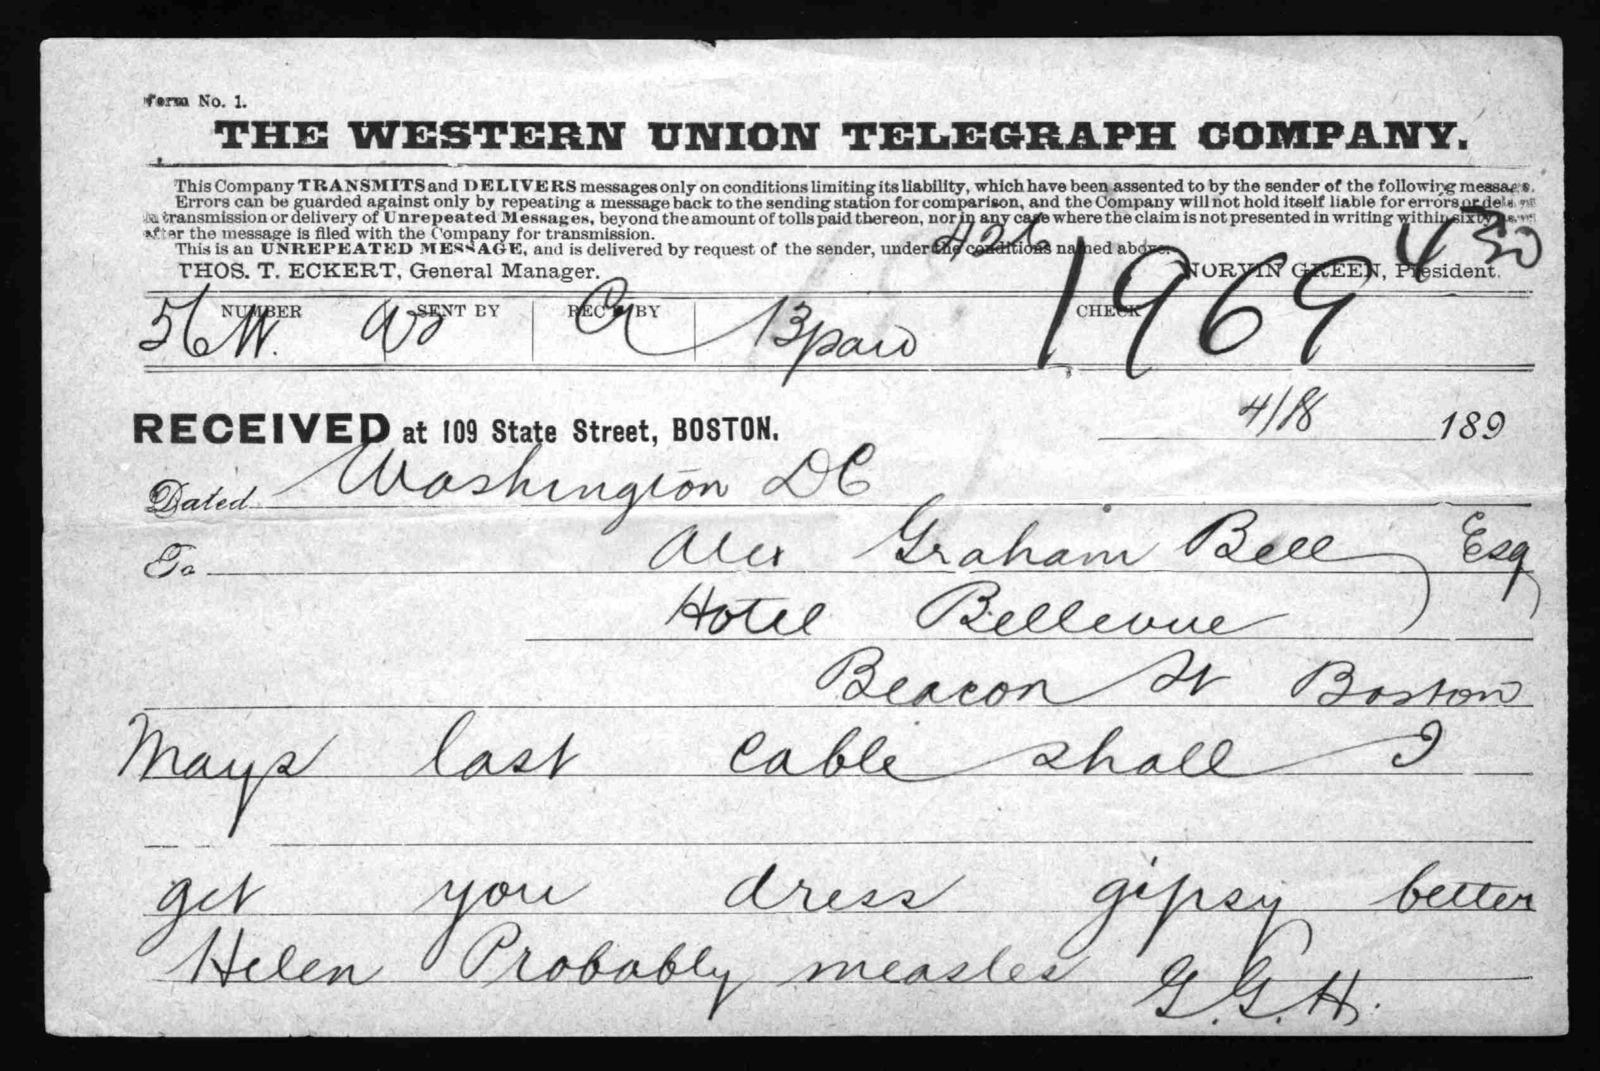 Telegram from Gardiner Greene Hubbard to Alexander Graham Bell, April 18